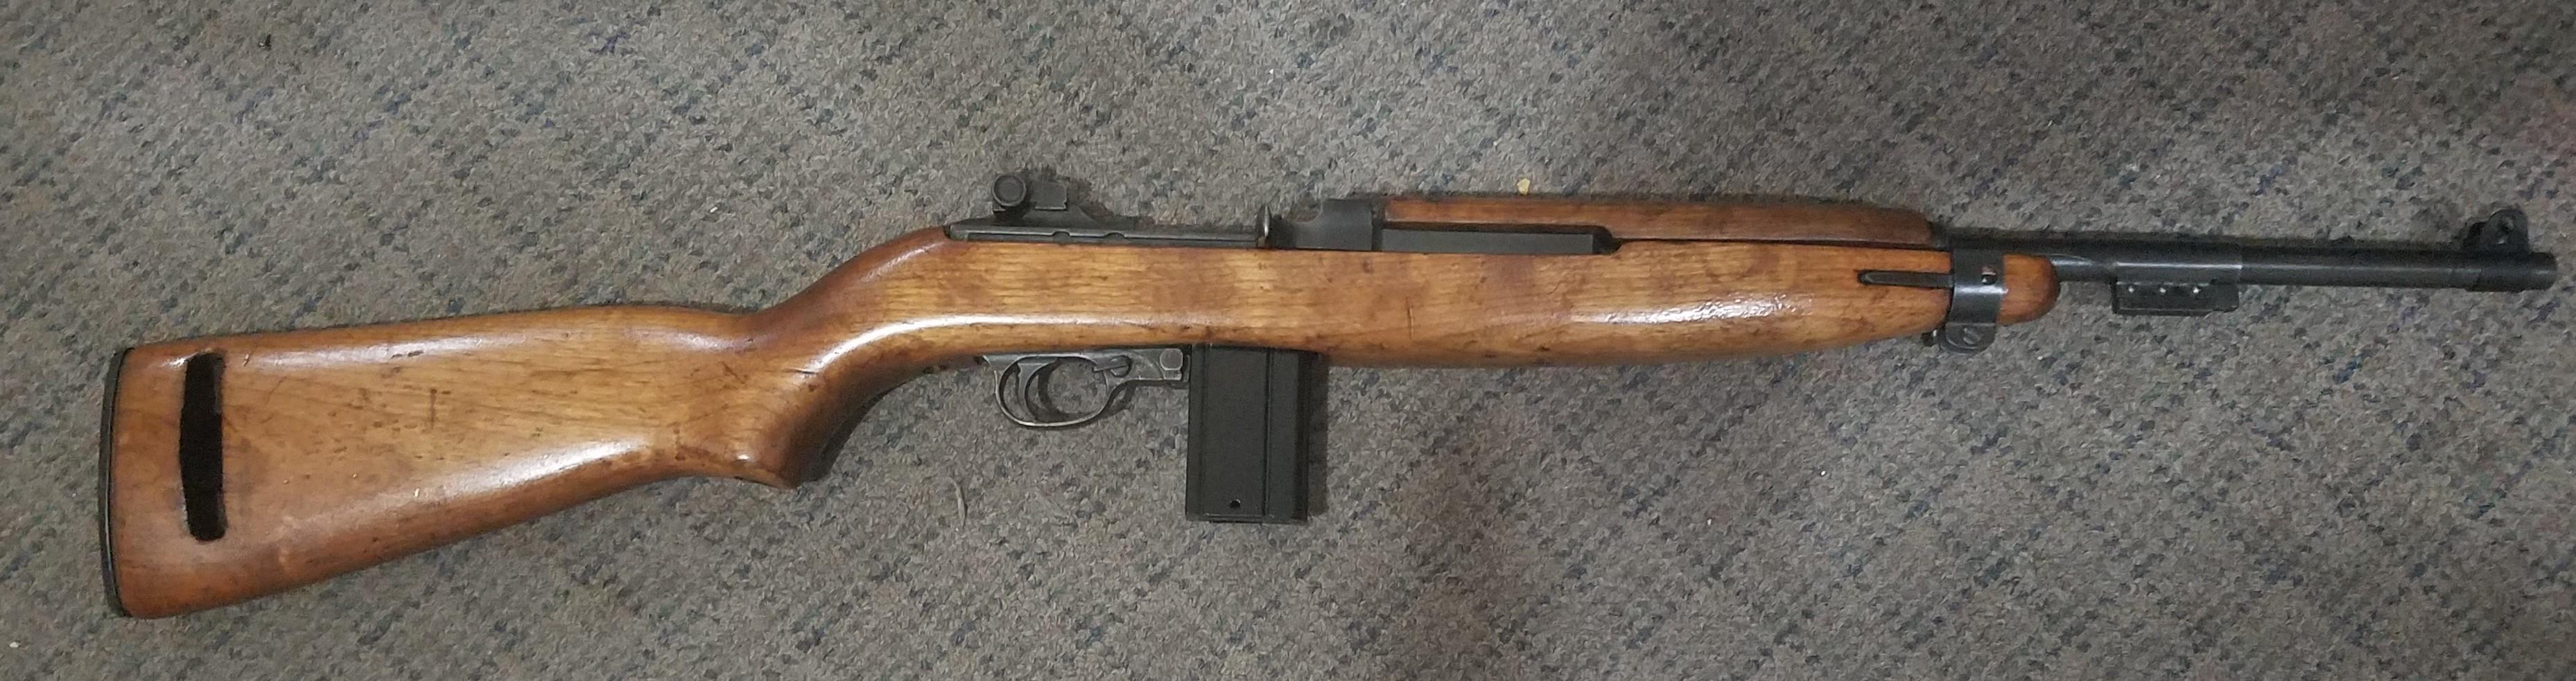 WTS:  M1 Carbines-20190206_164904.jpg